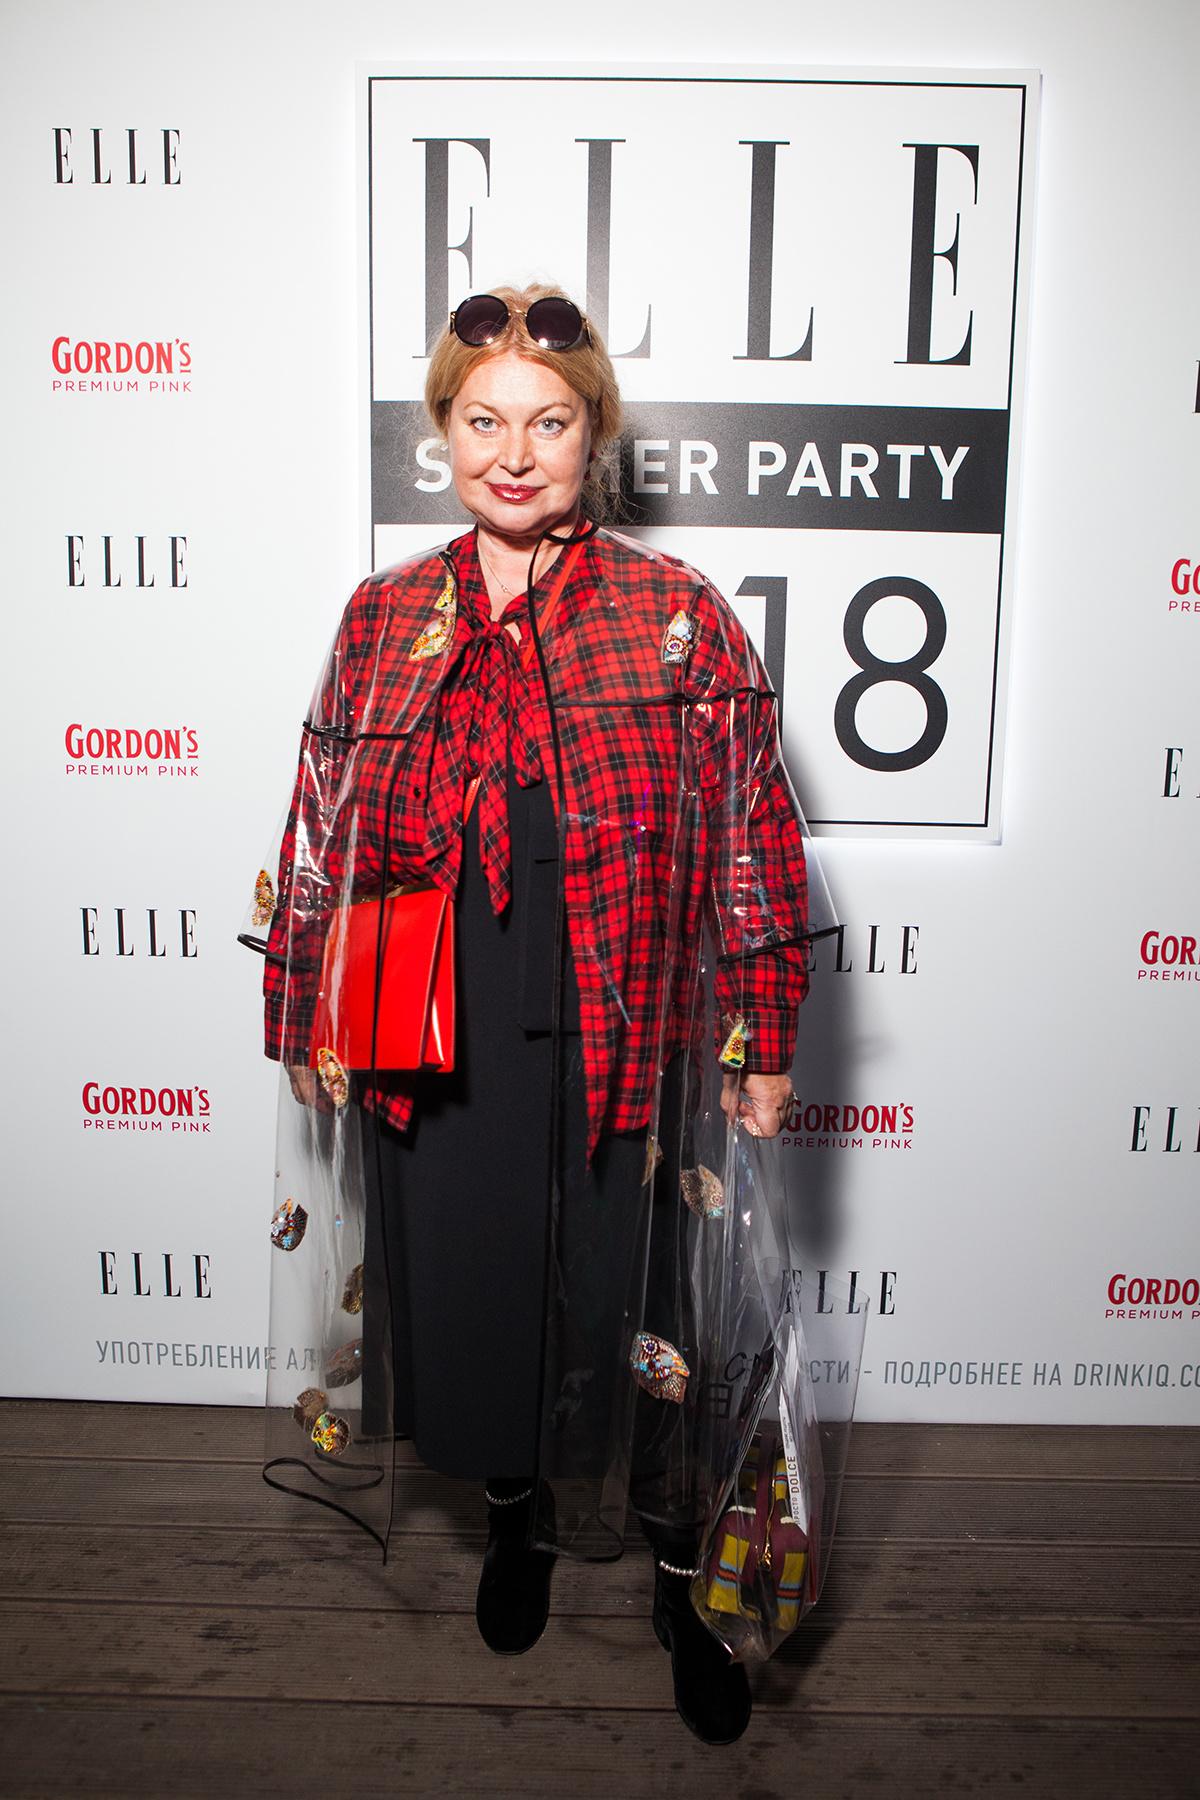 Elle Summer Party (галерея 4, фото 4)